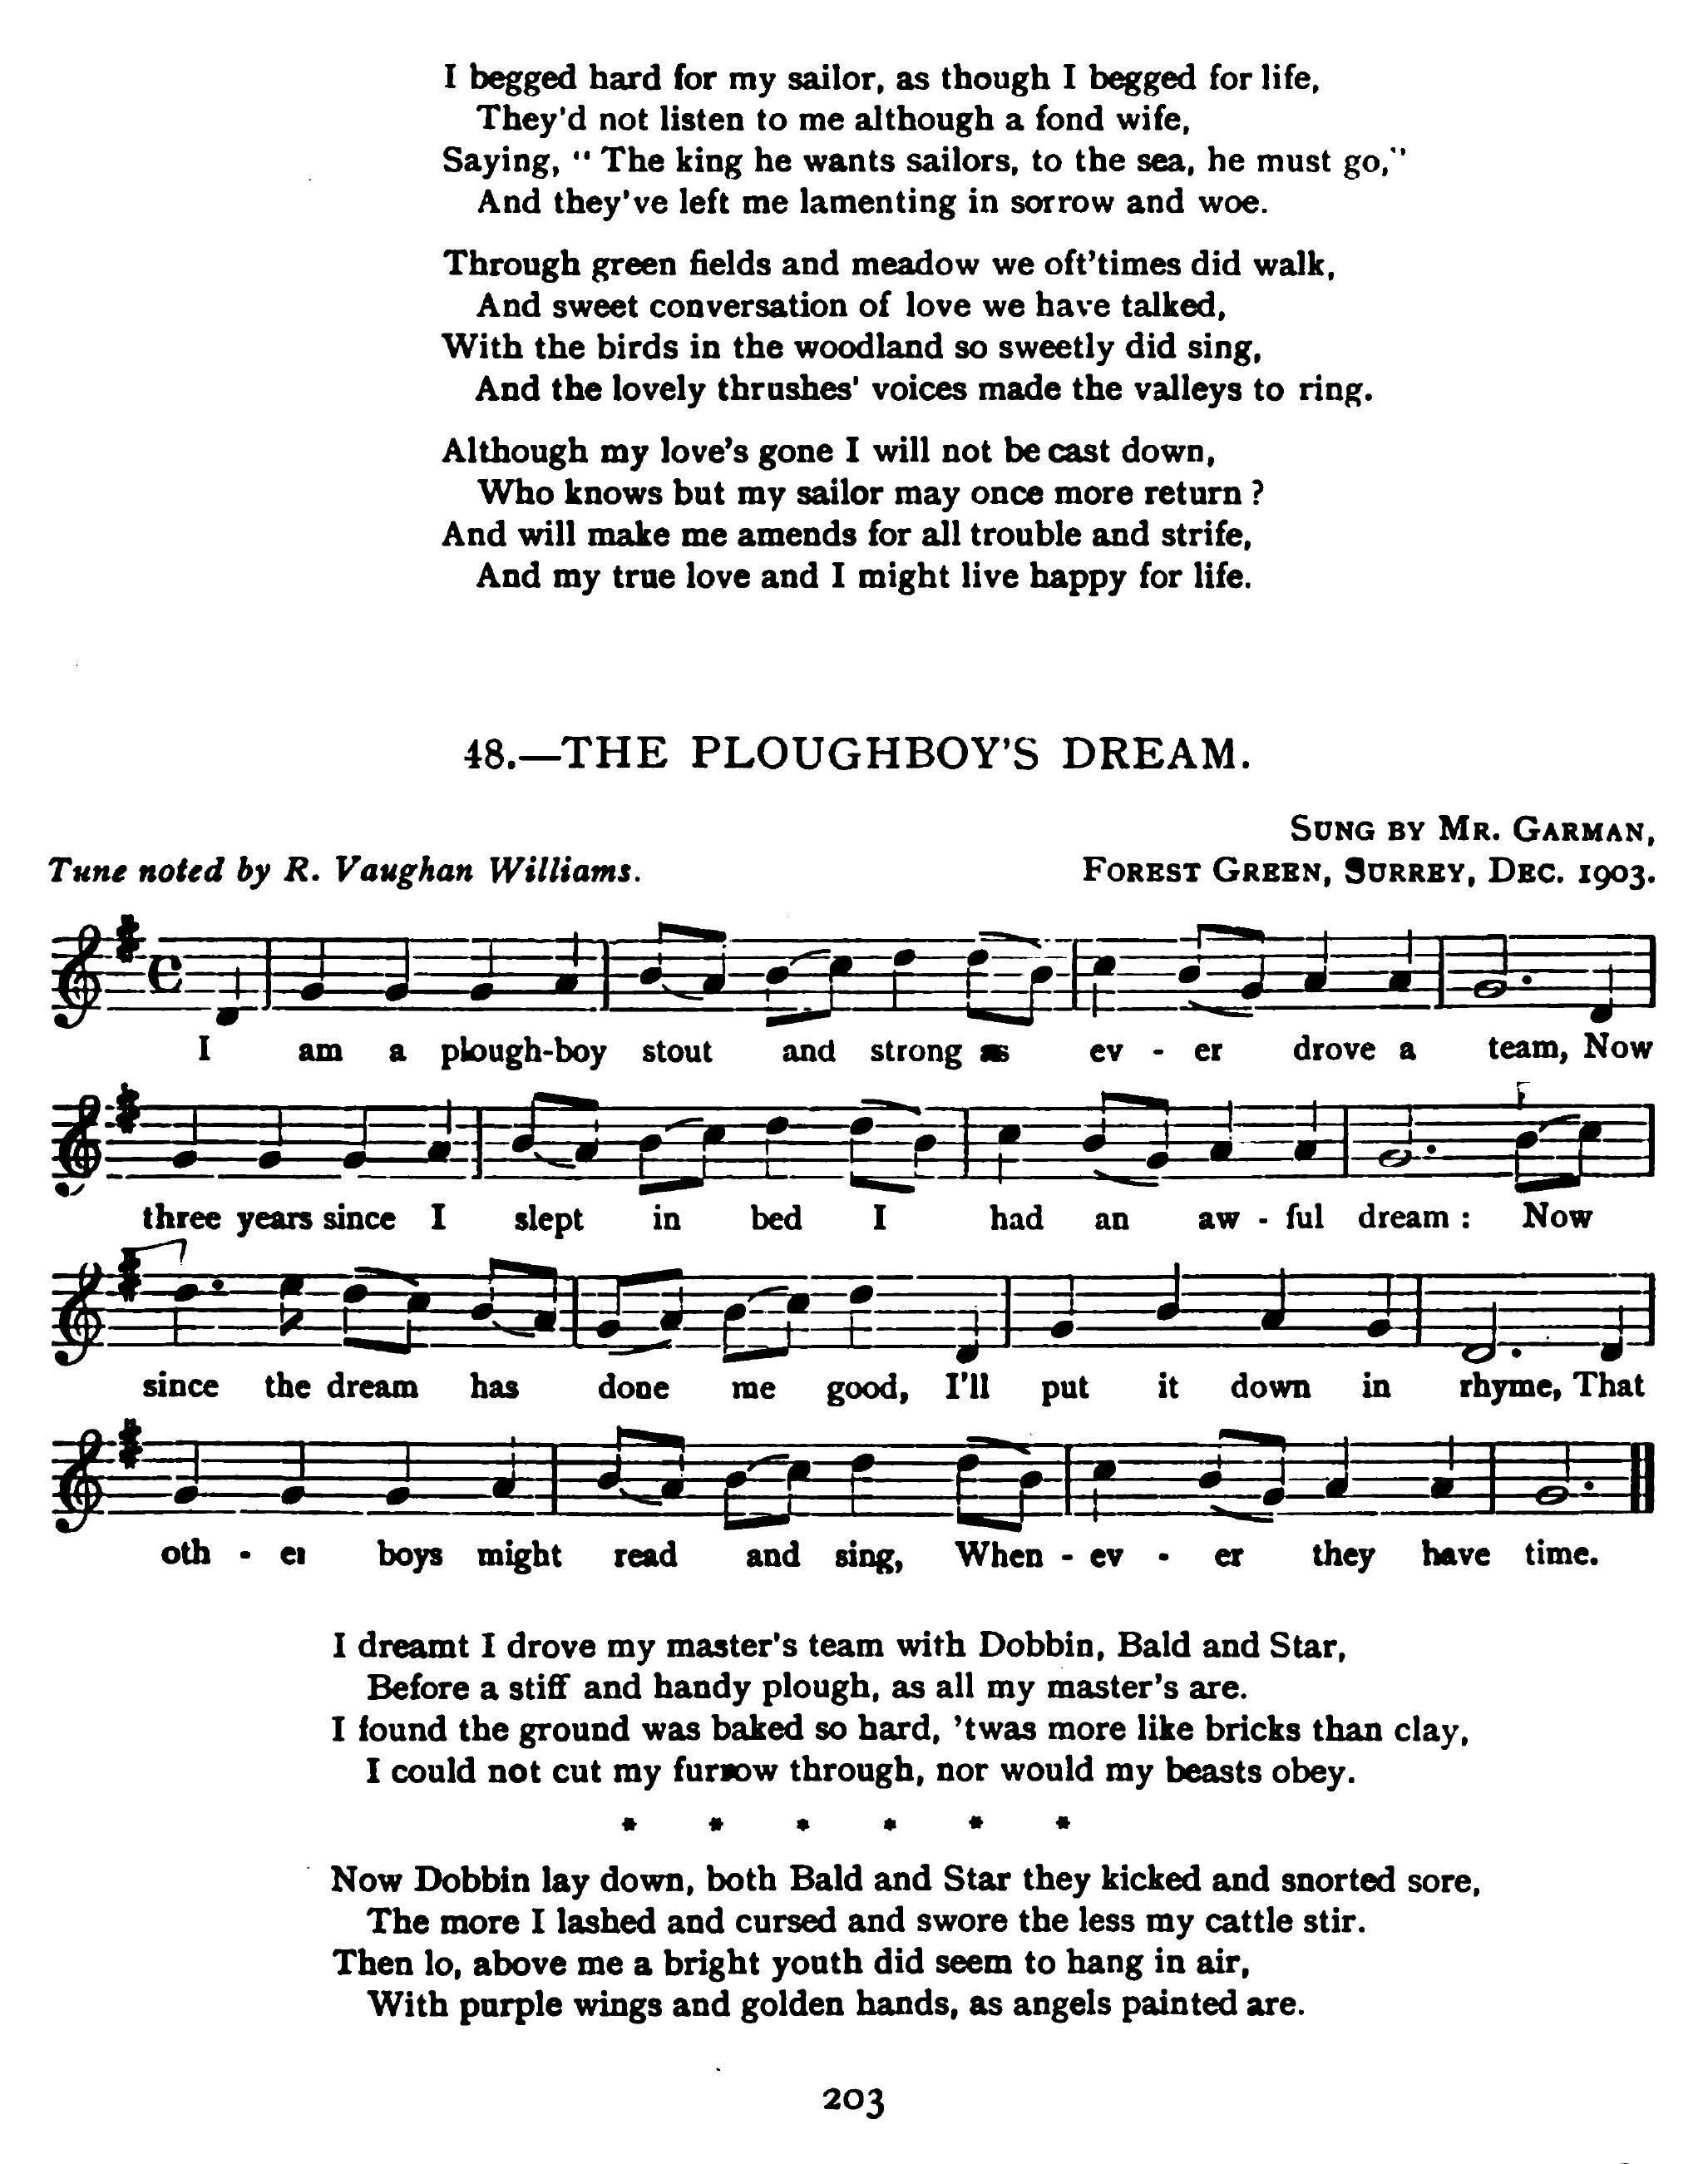 PloughboysDream-JournalFolkSongSociety-1906.jpg